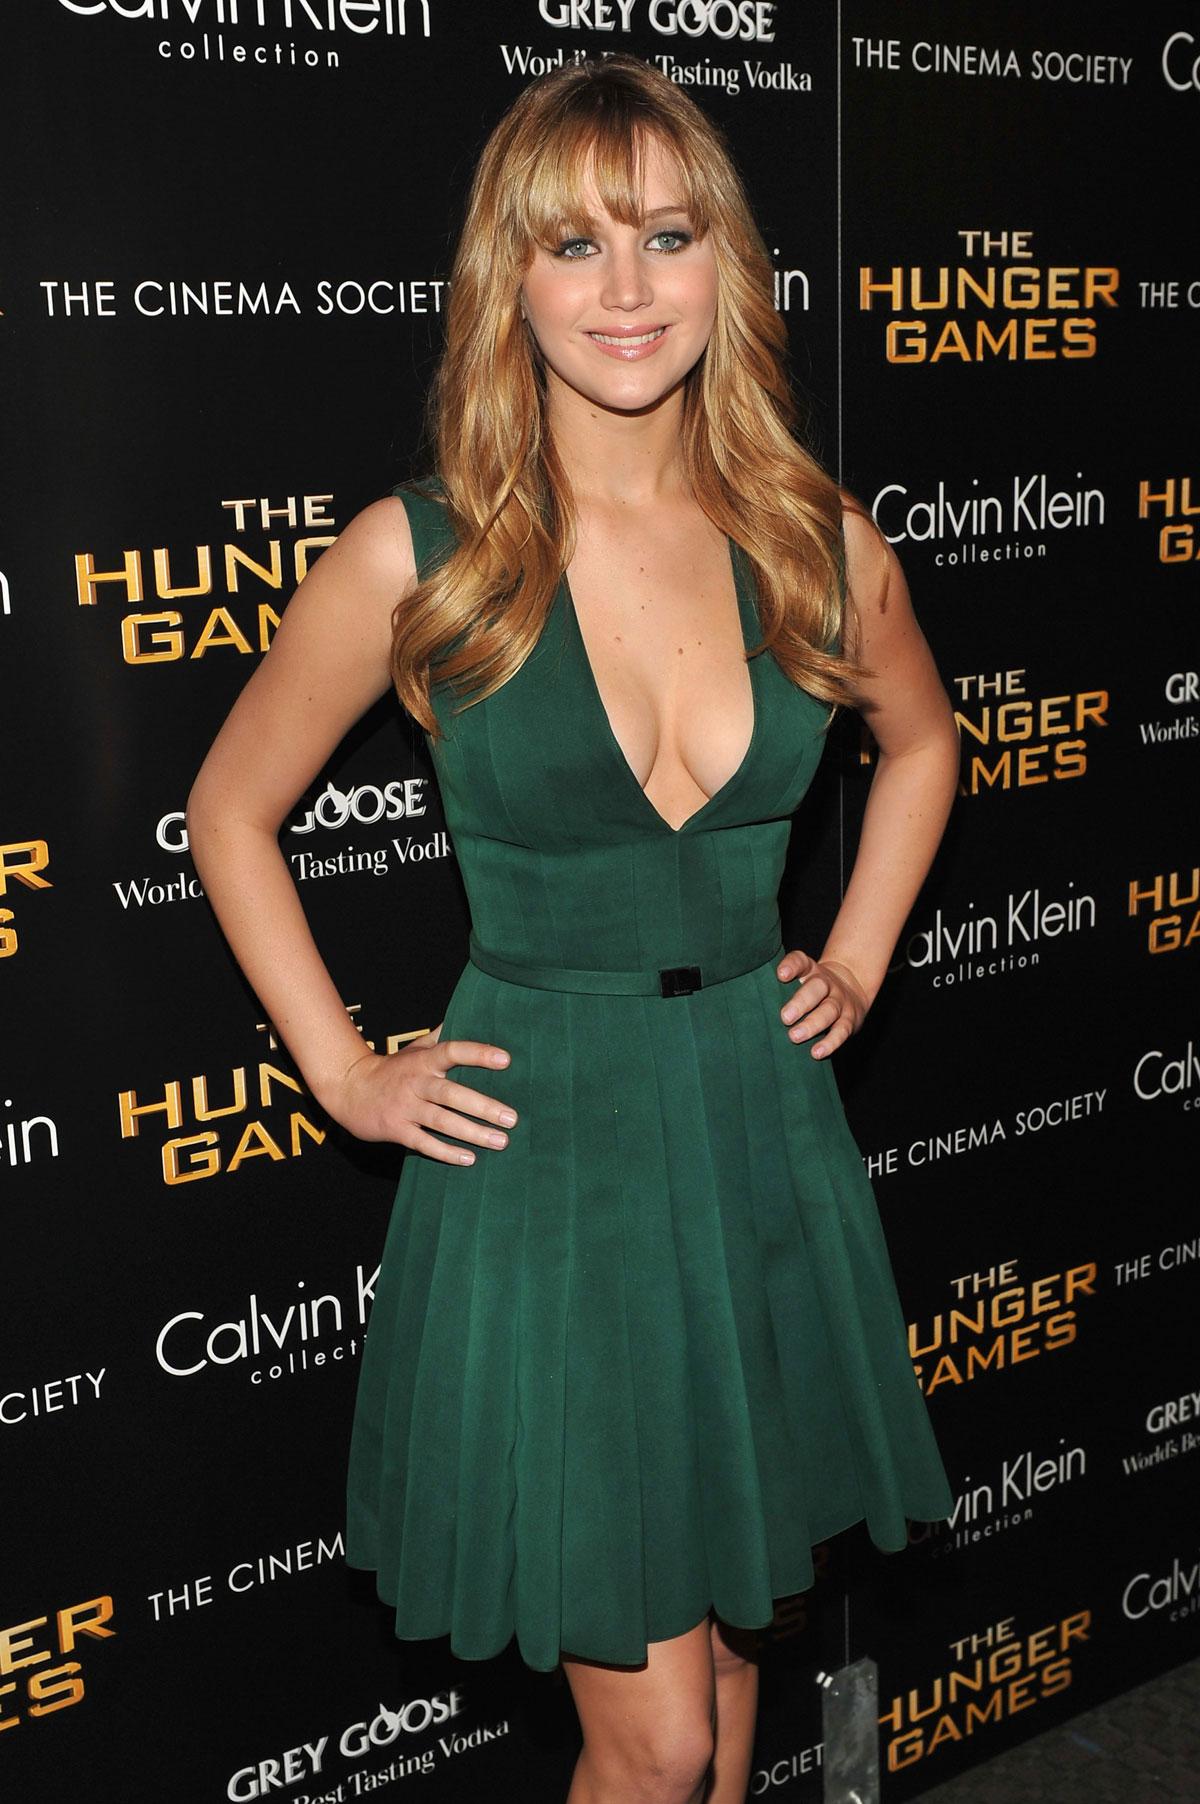 Calvin Kleins 5000 Katniss Dress Inspired By Hunger